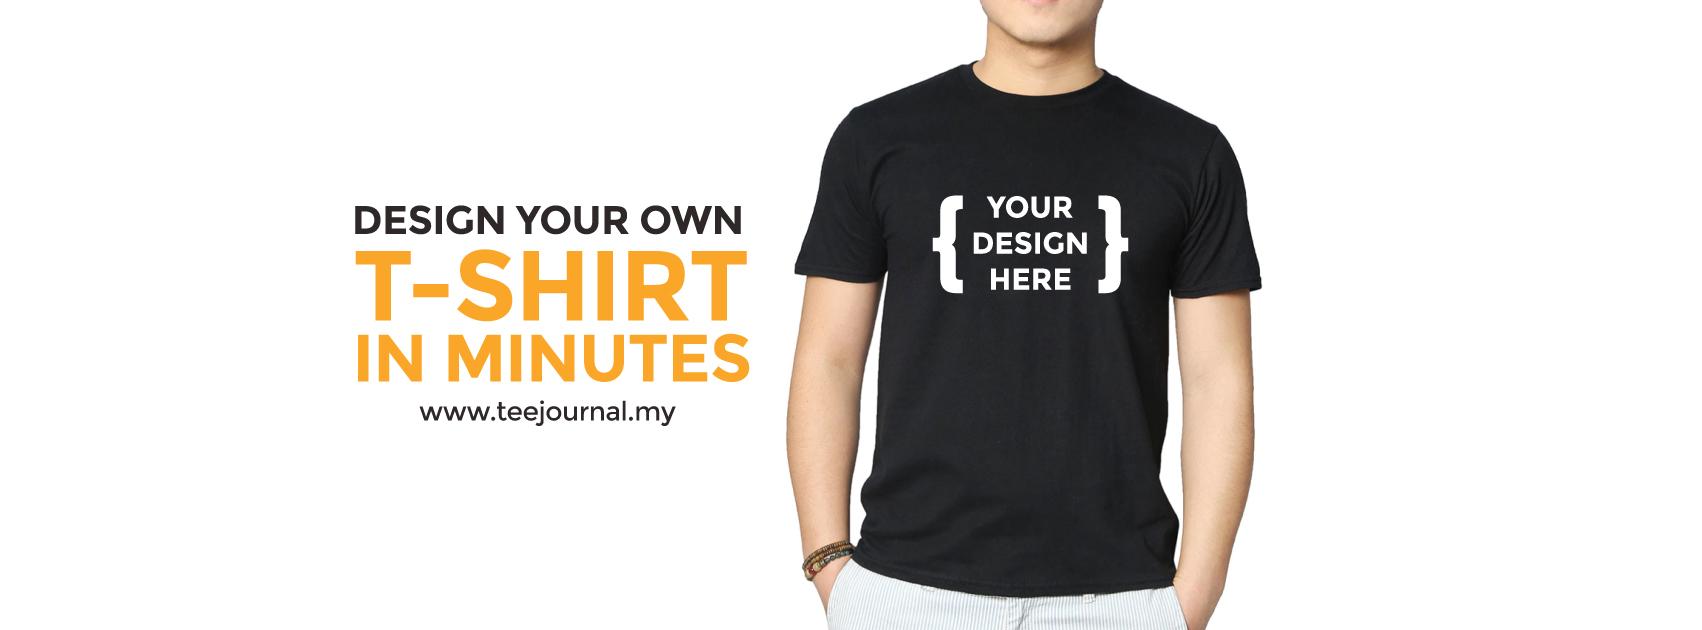 Print on Demand T-Shirt and Merchandise Fulfilment Malaysia